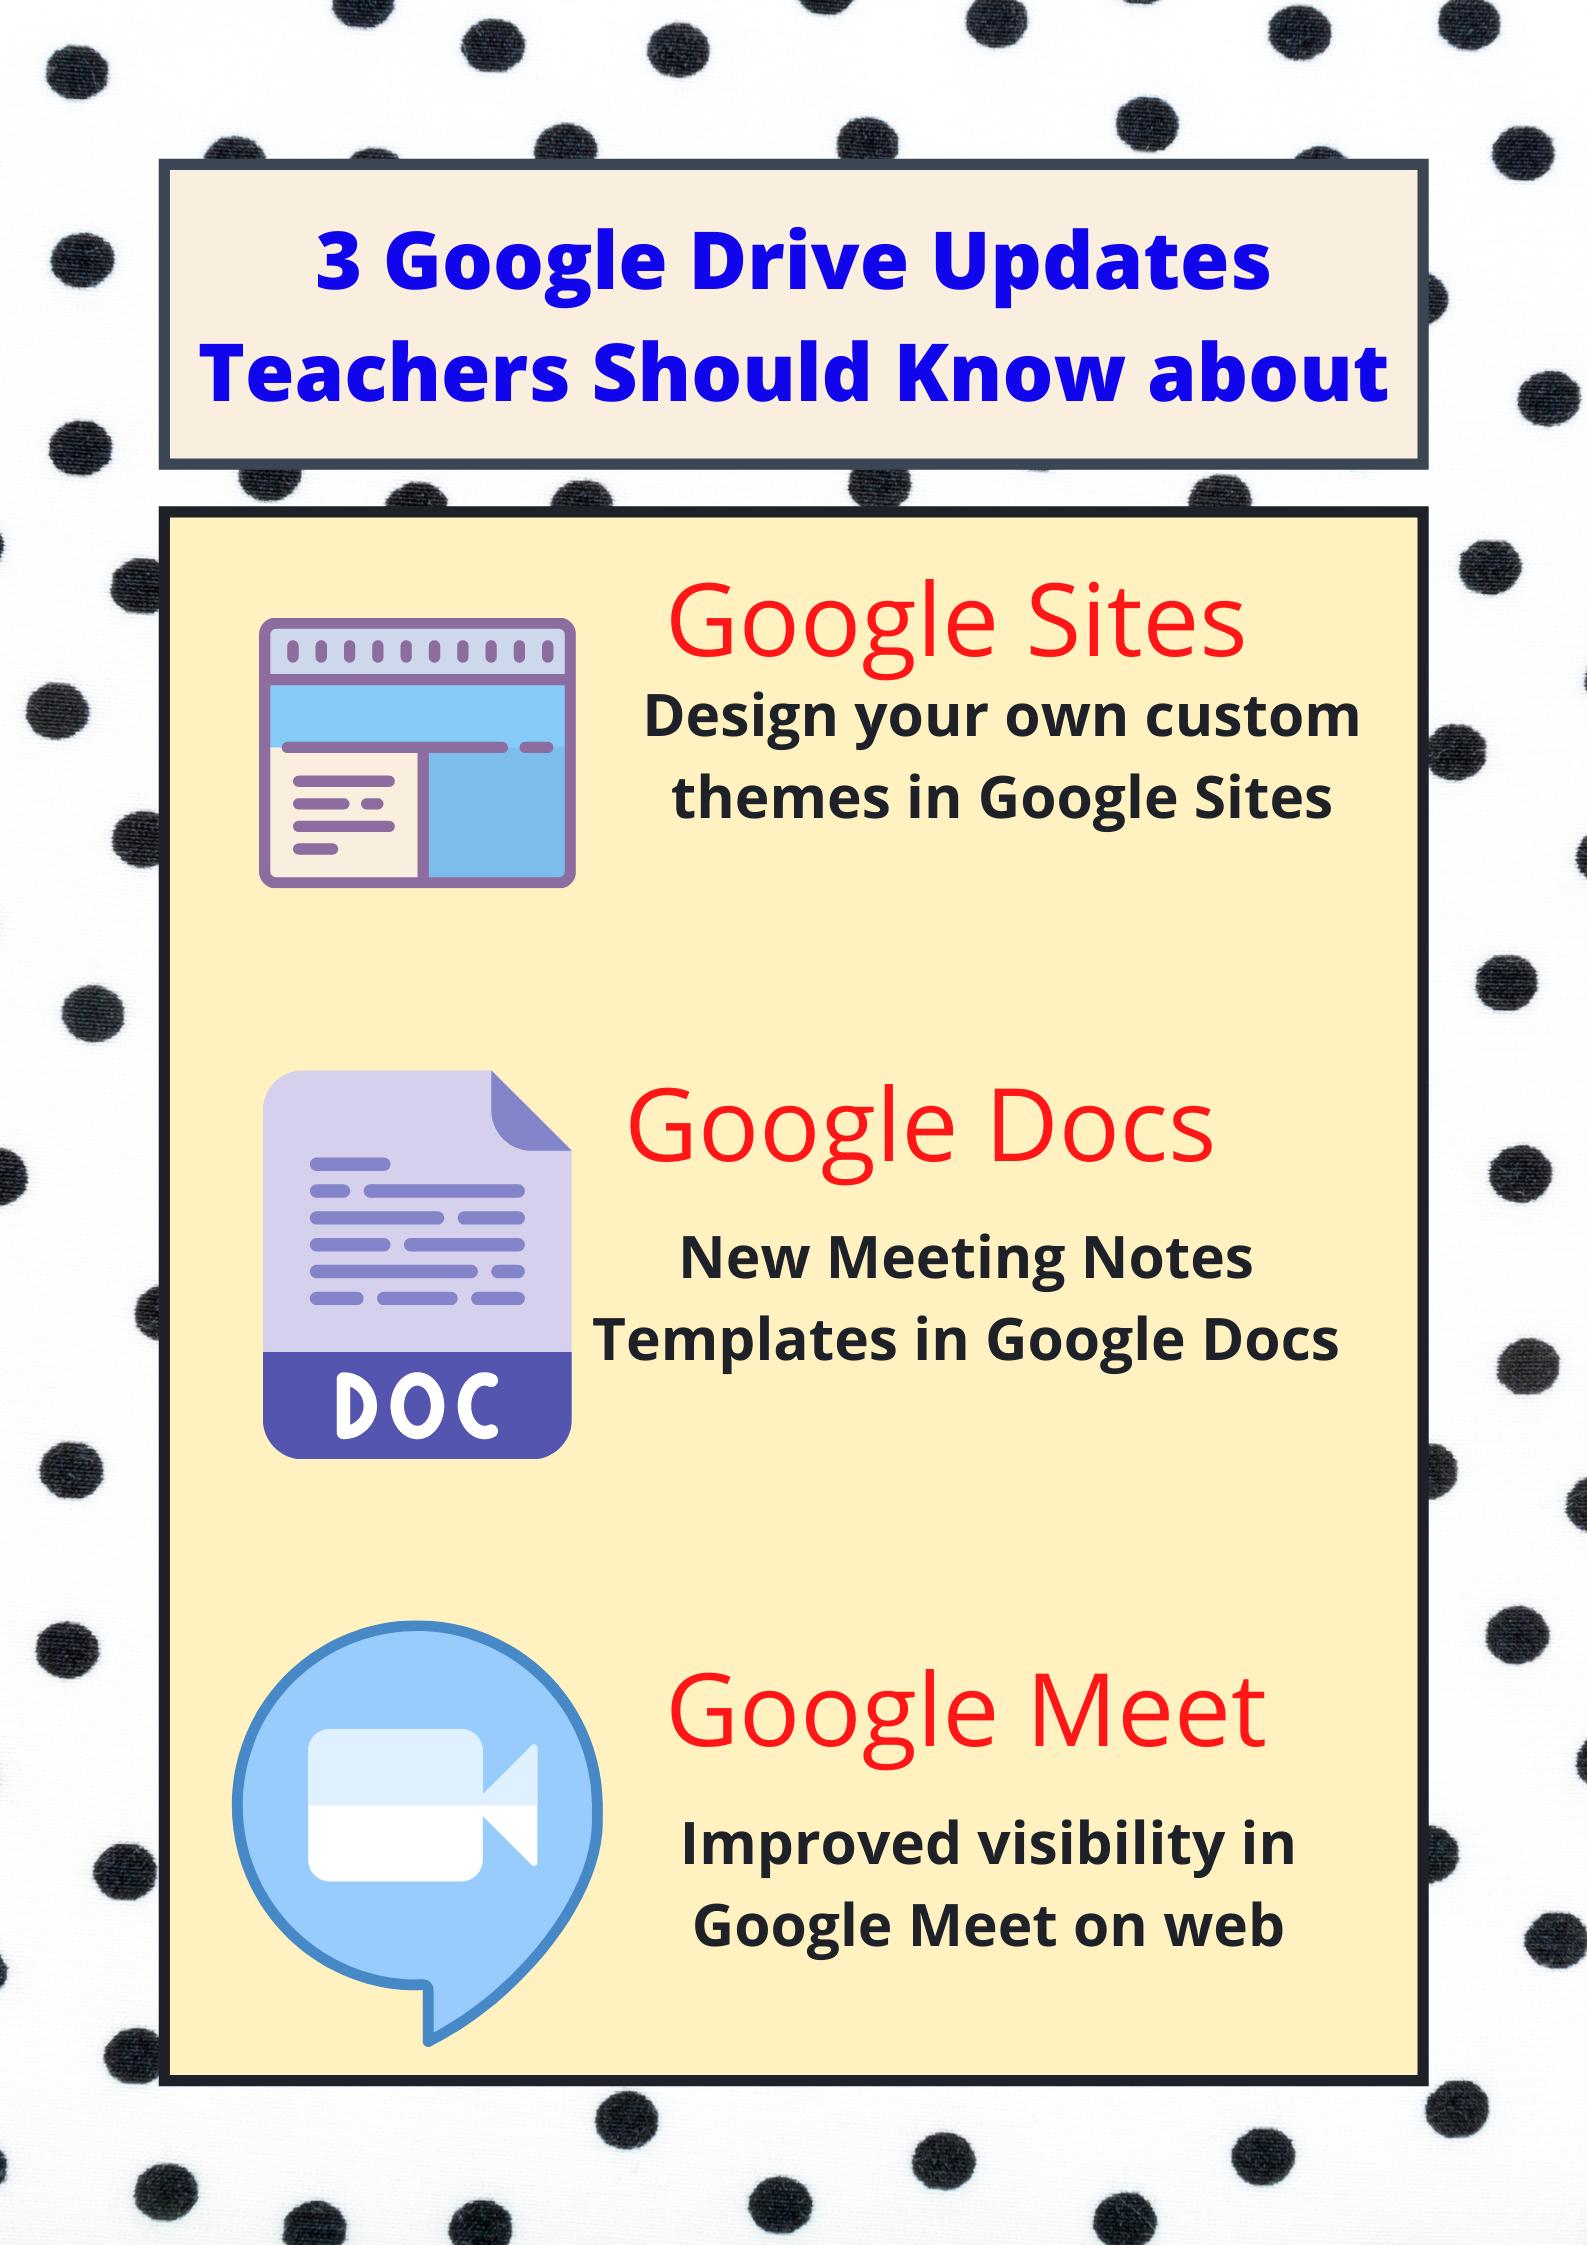 3 Google Drive Updates Teachers Should Know about